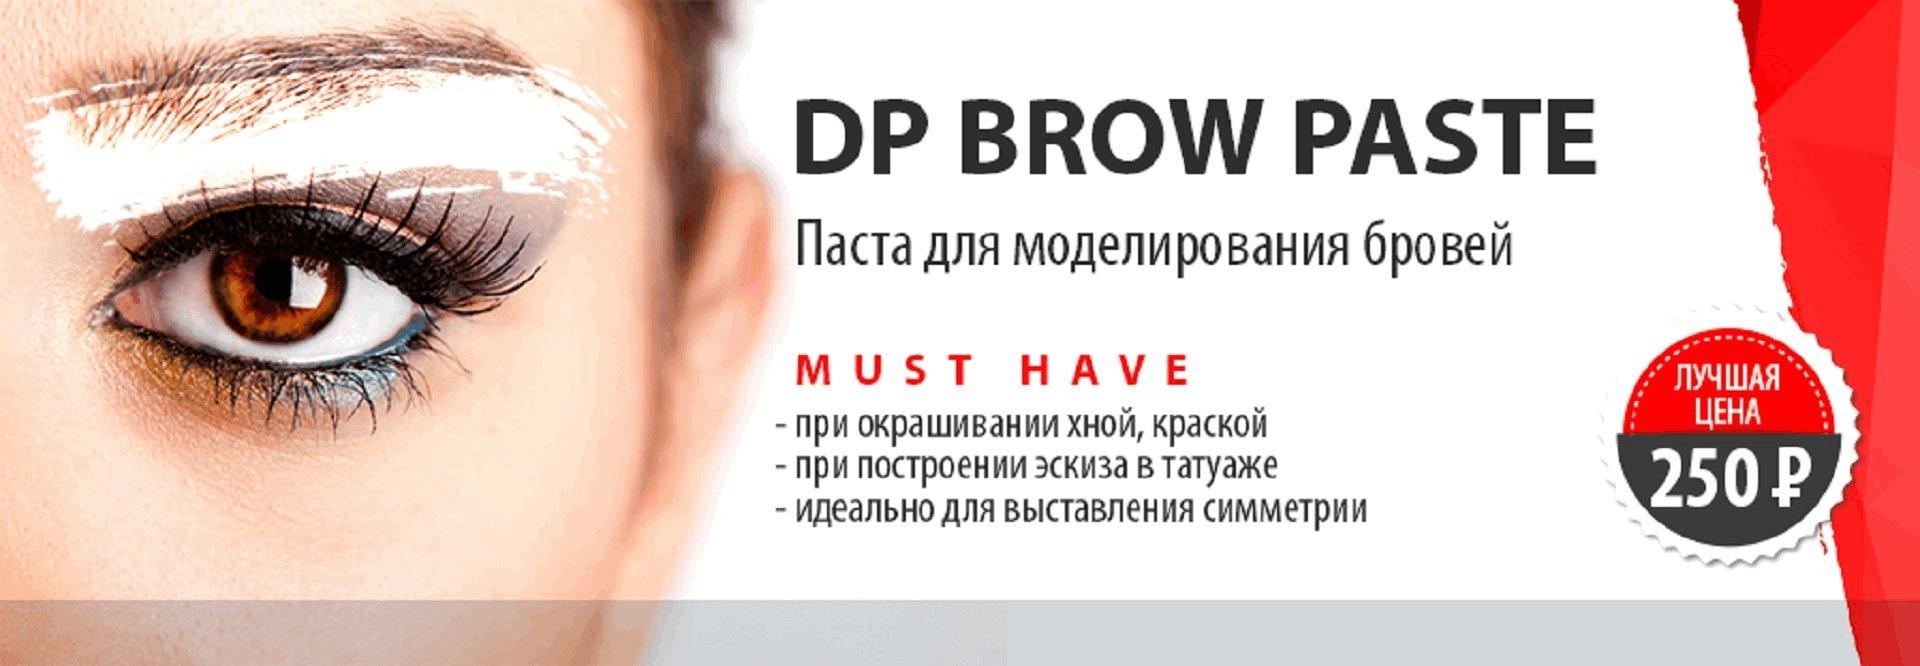 DP Brow Paste